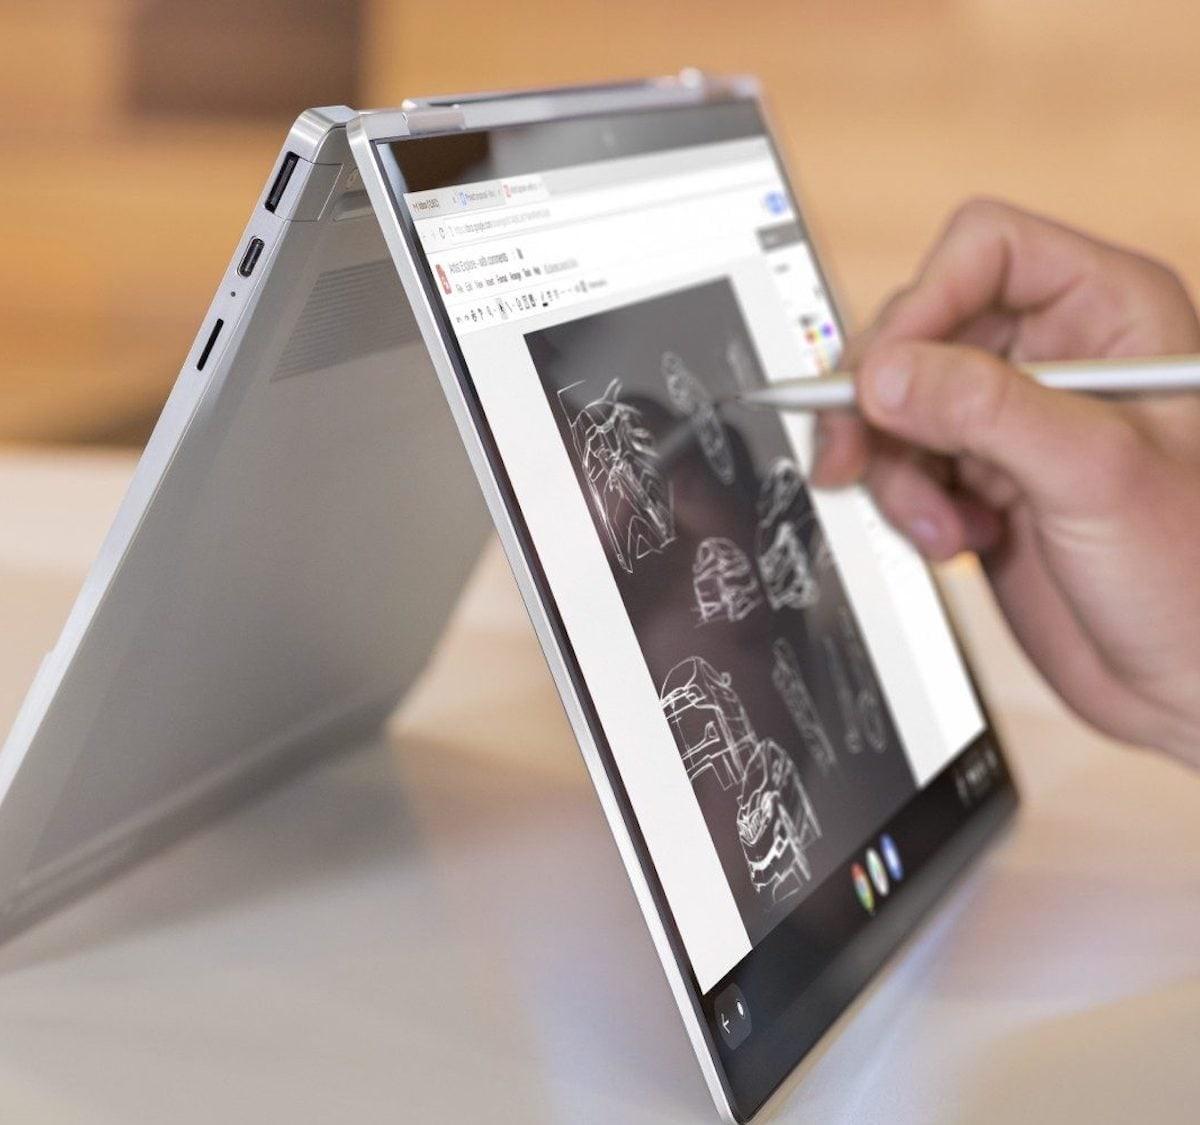 HP Elite c1030 Chromebook Enterprise Ultrathin Laptop offers a 13.5″ micro-edge display